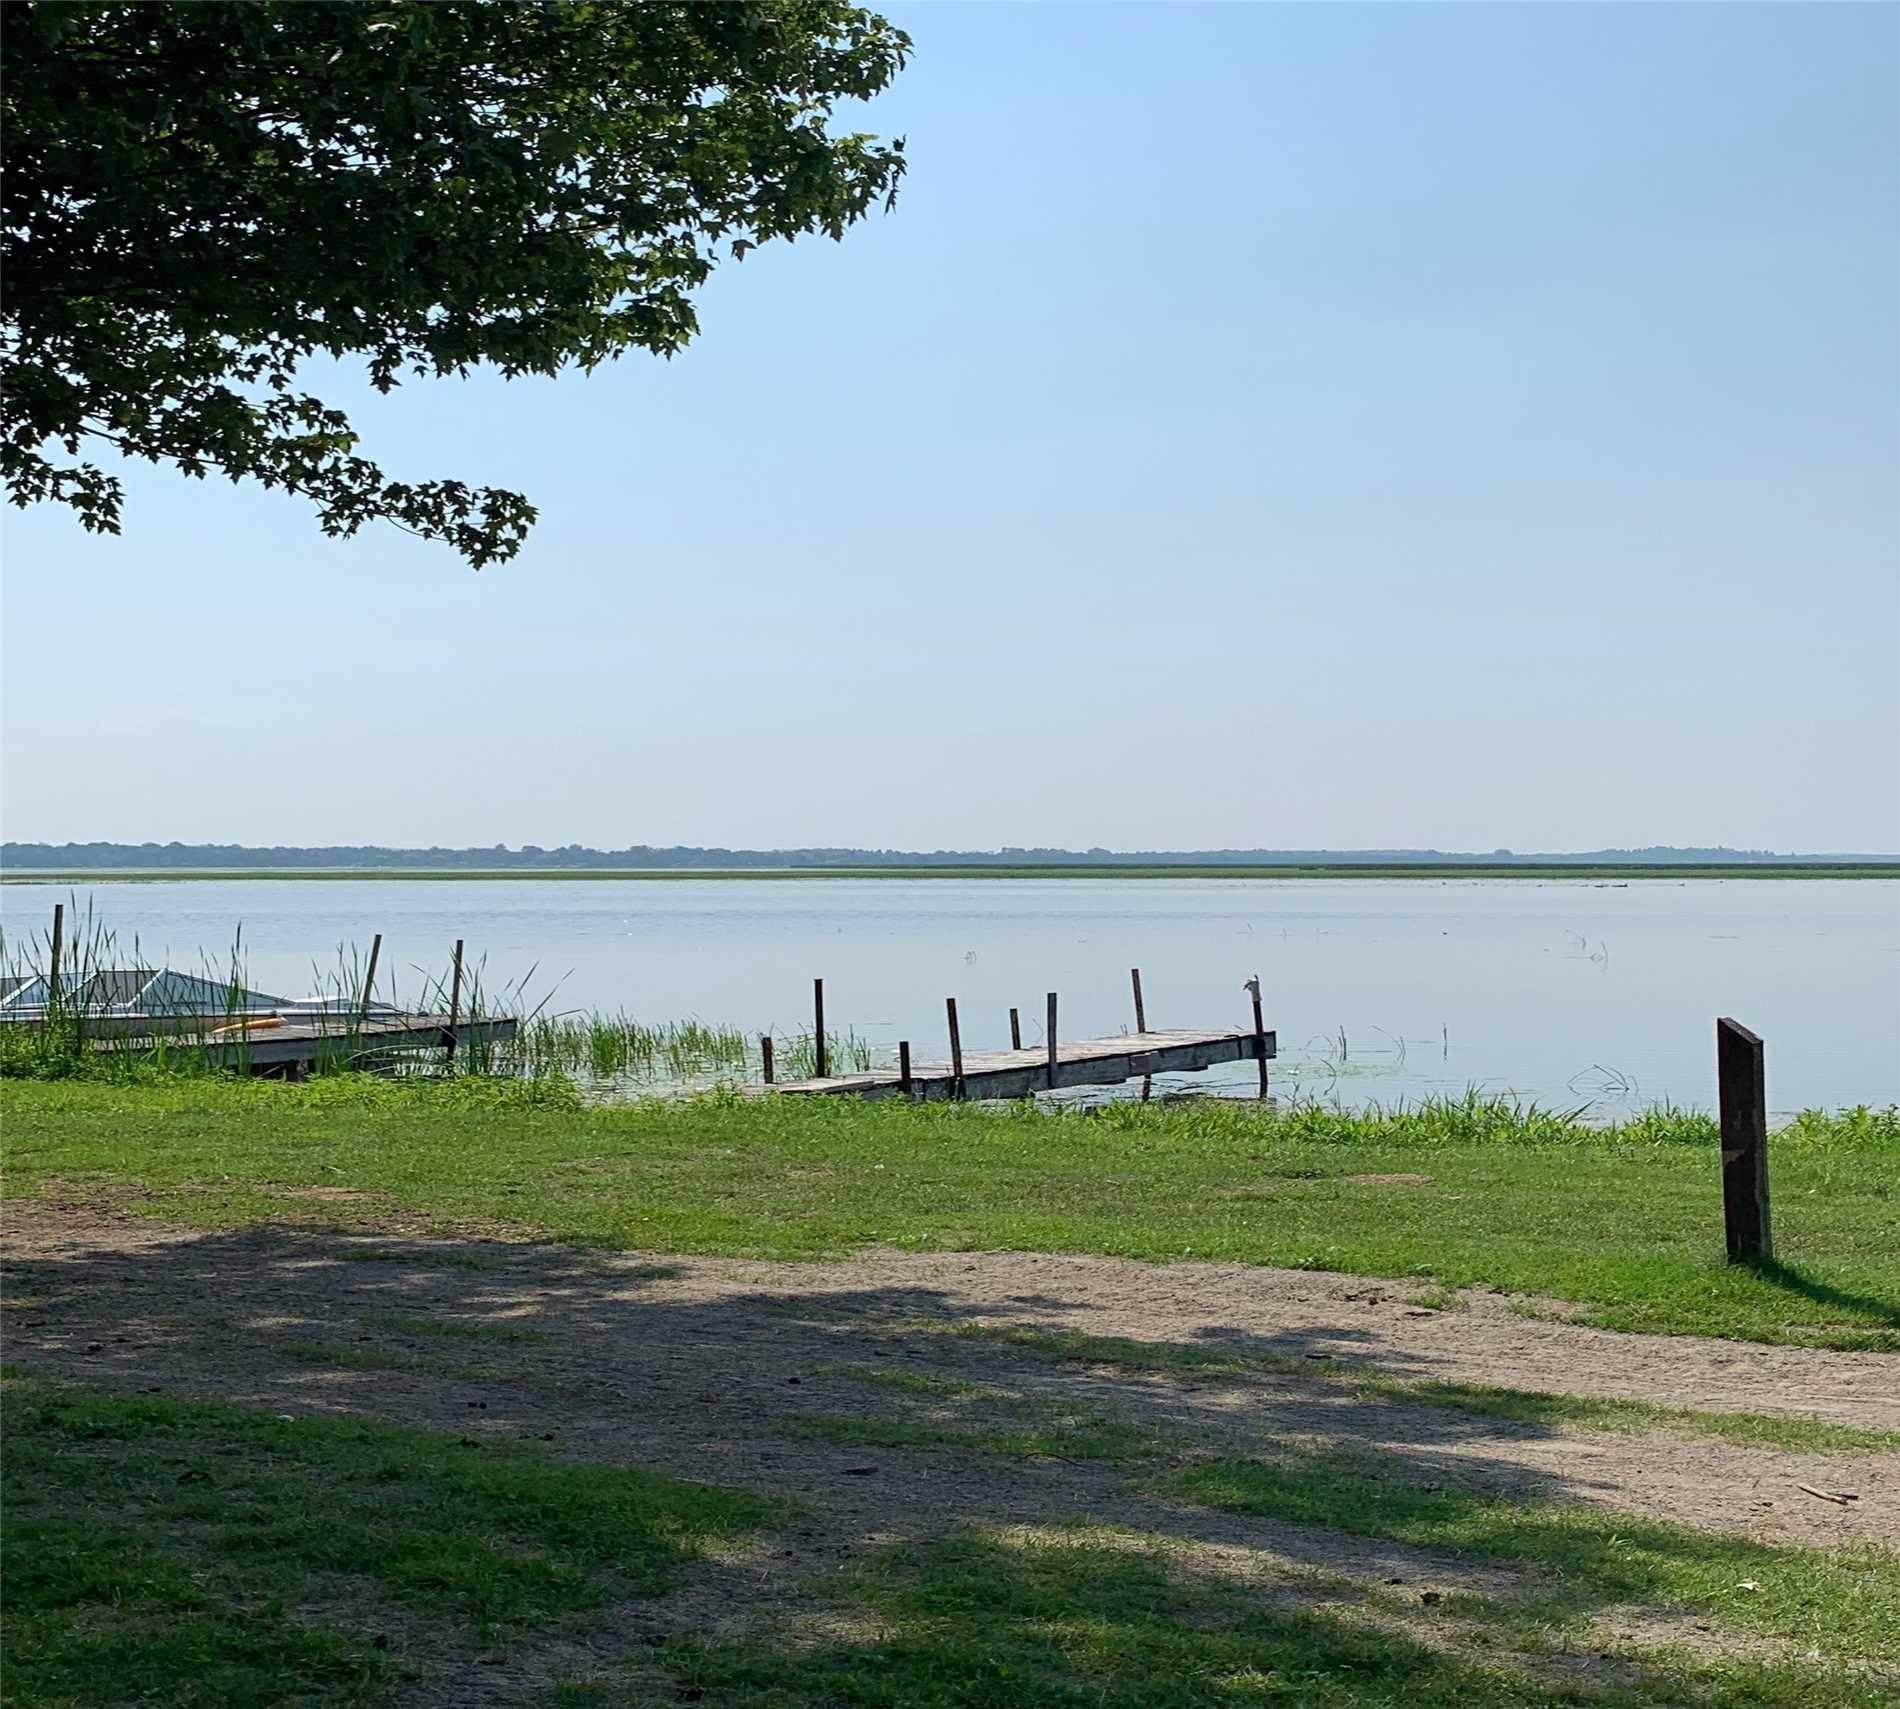 252 Crosby Drive Kawartha Lakes For Sale 334 900